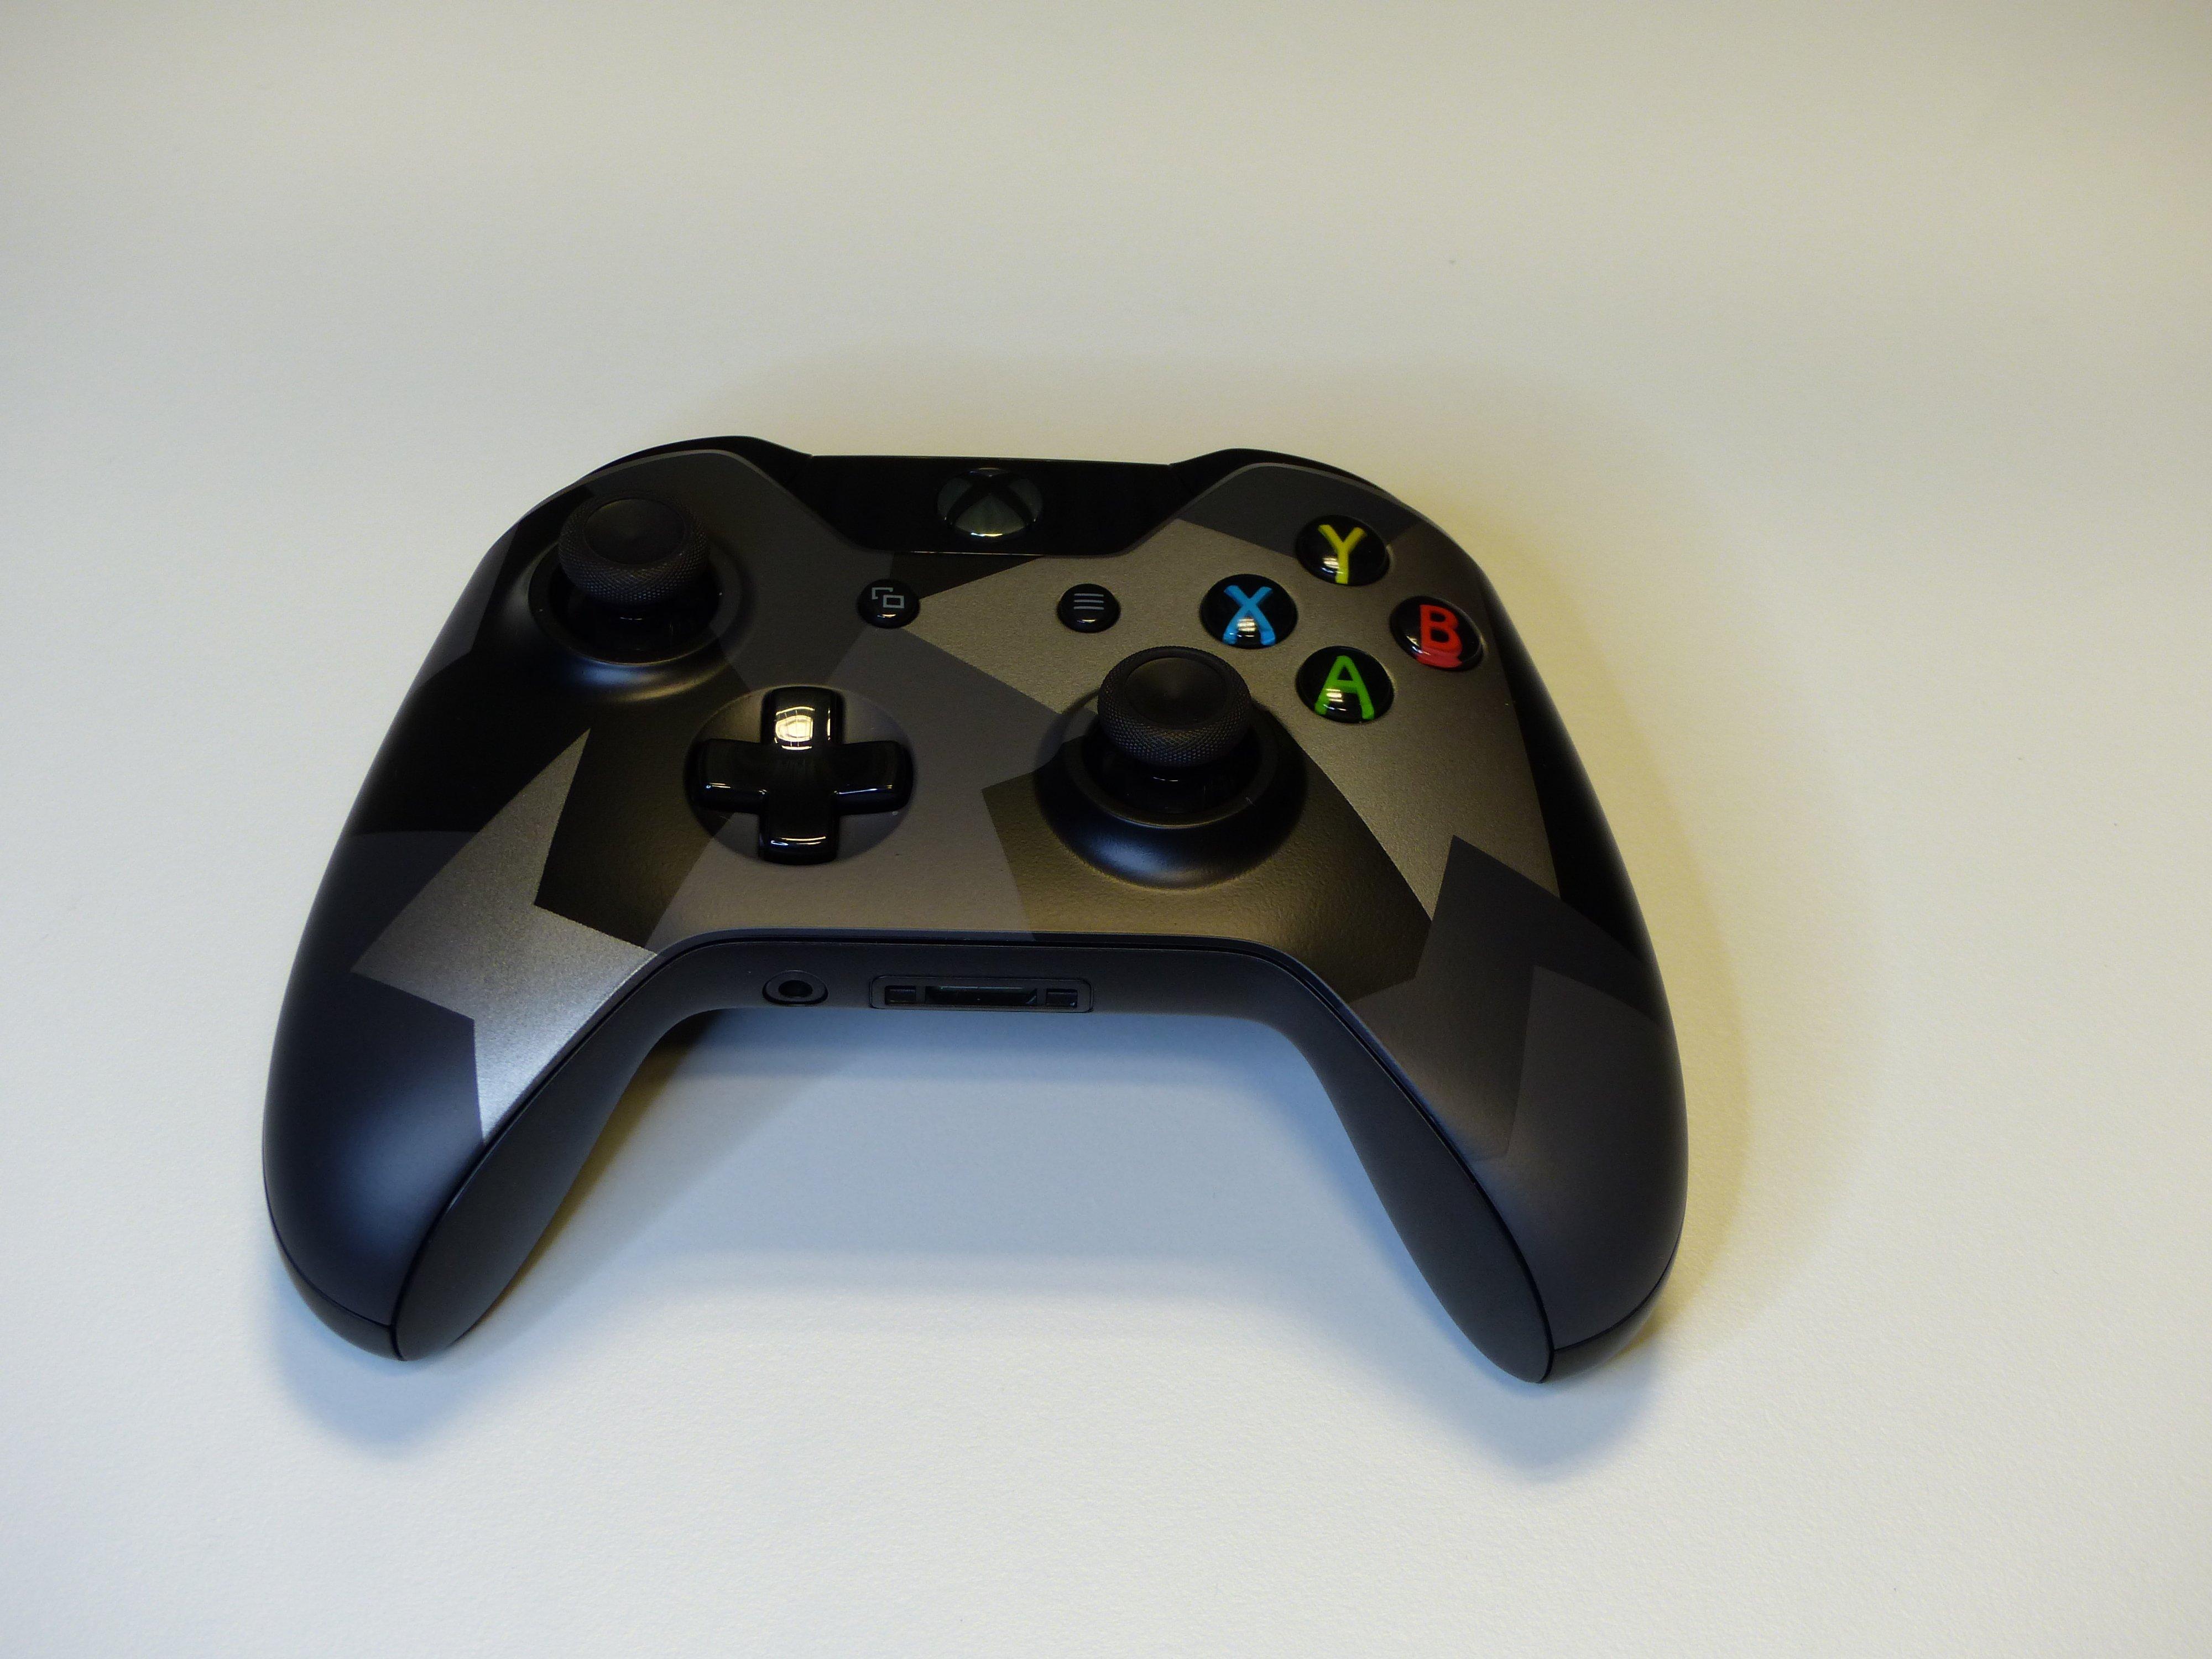 Xbox One Wireless Controller 1697 Teardown - iFixit Xbox External Audio Wiring Diagram on